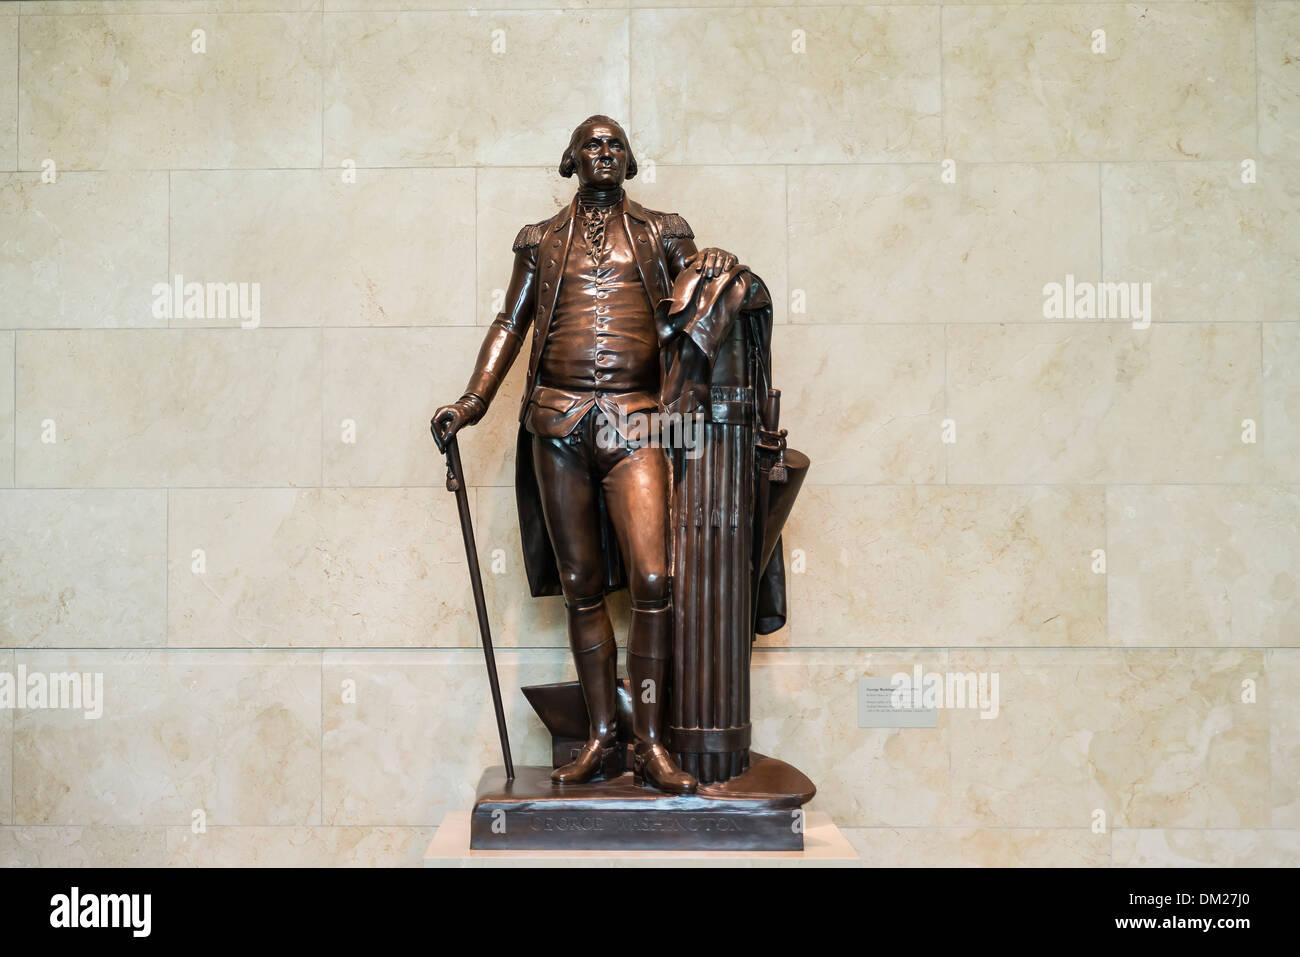 Bronze sculpture of George Washington at visitors center at Mt Vernon, Virginia, USA - Stock Image